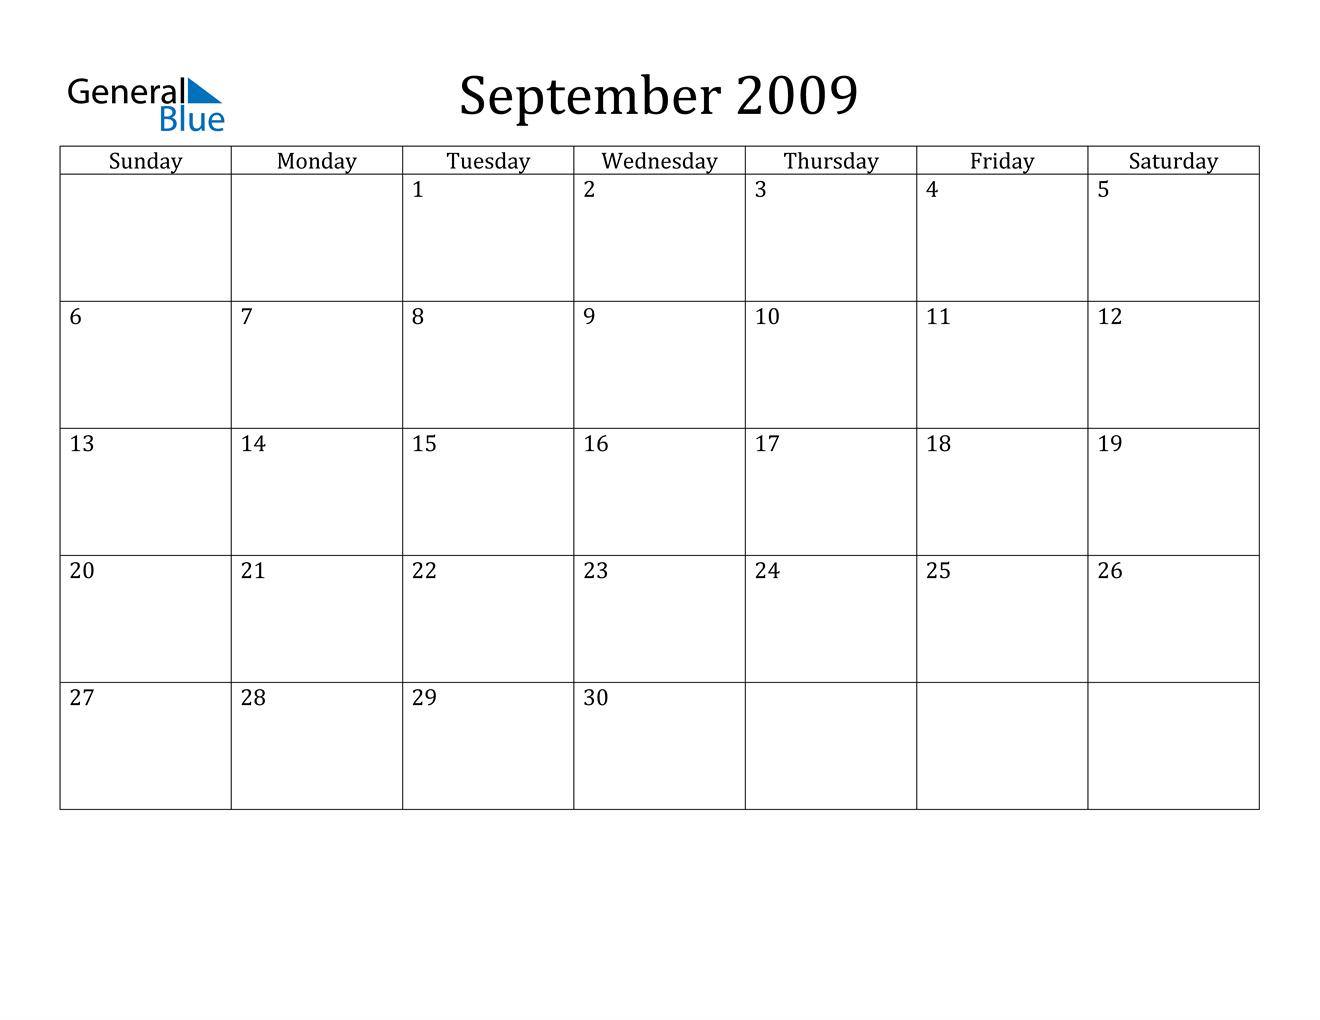 September 2009 Calendar - Printable Old Calendars